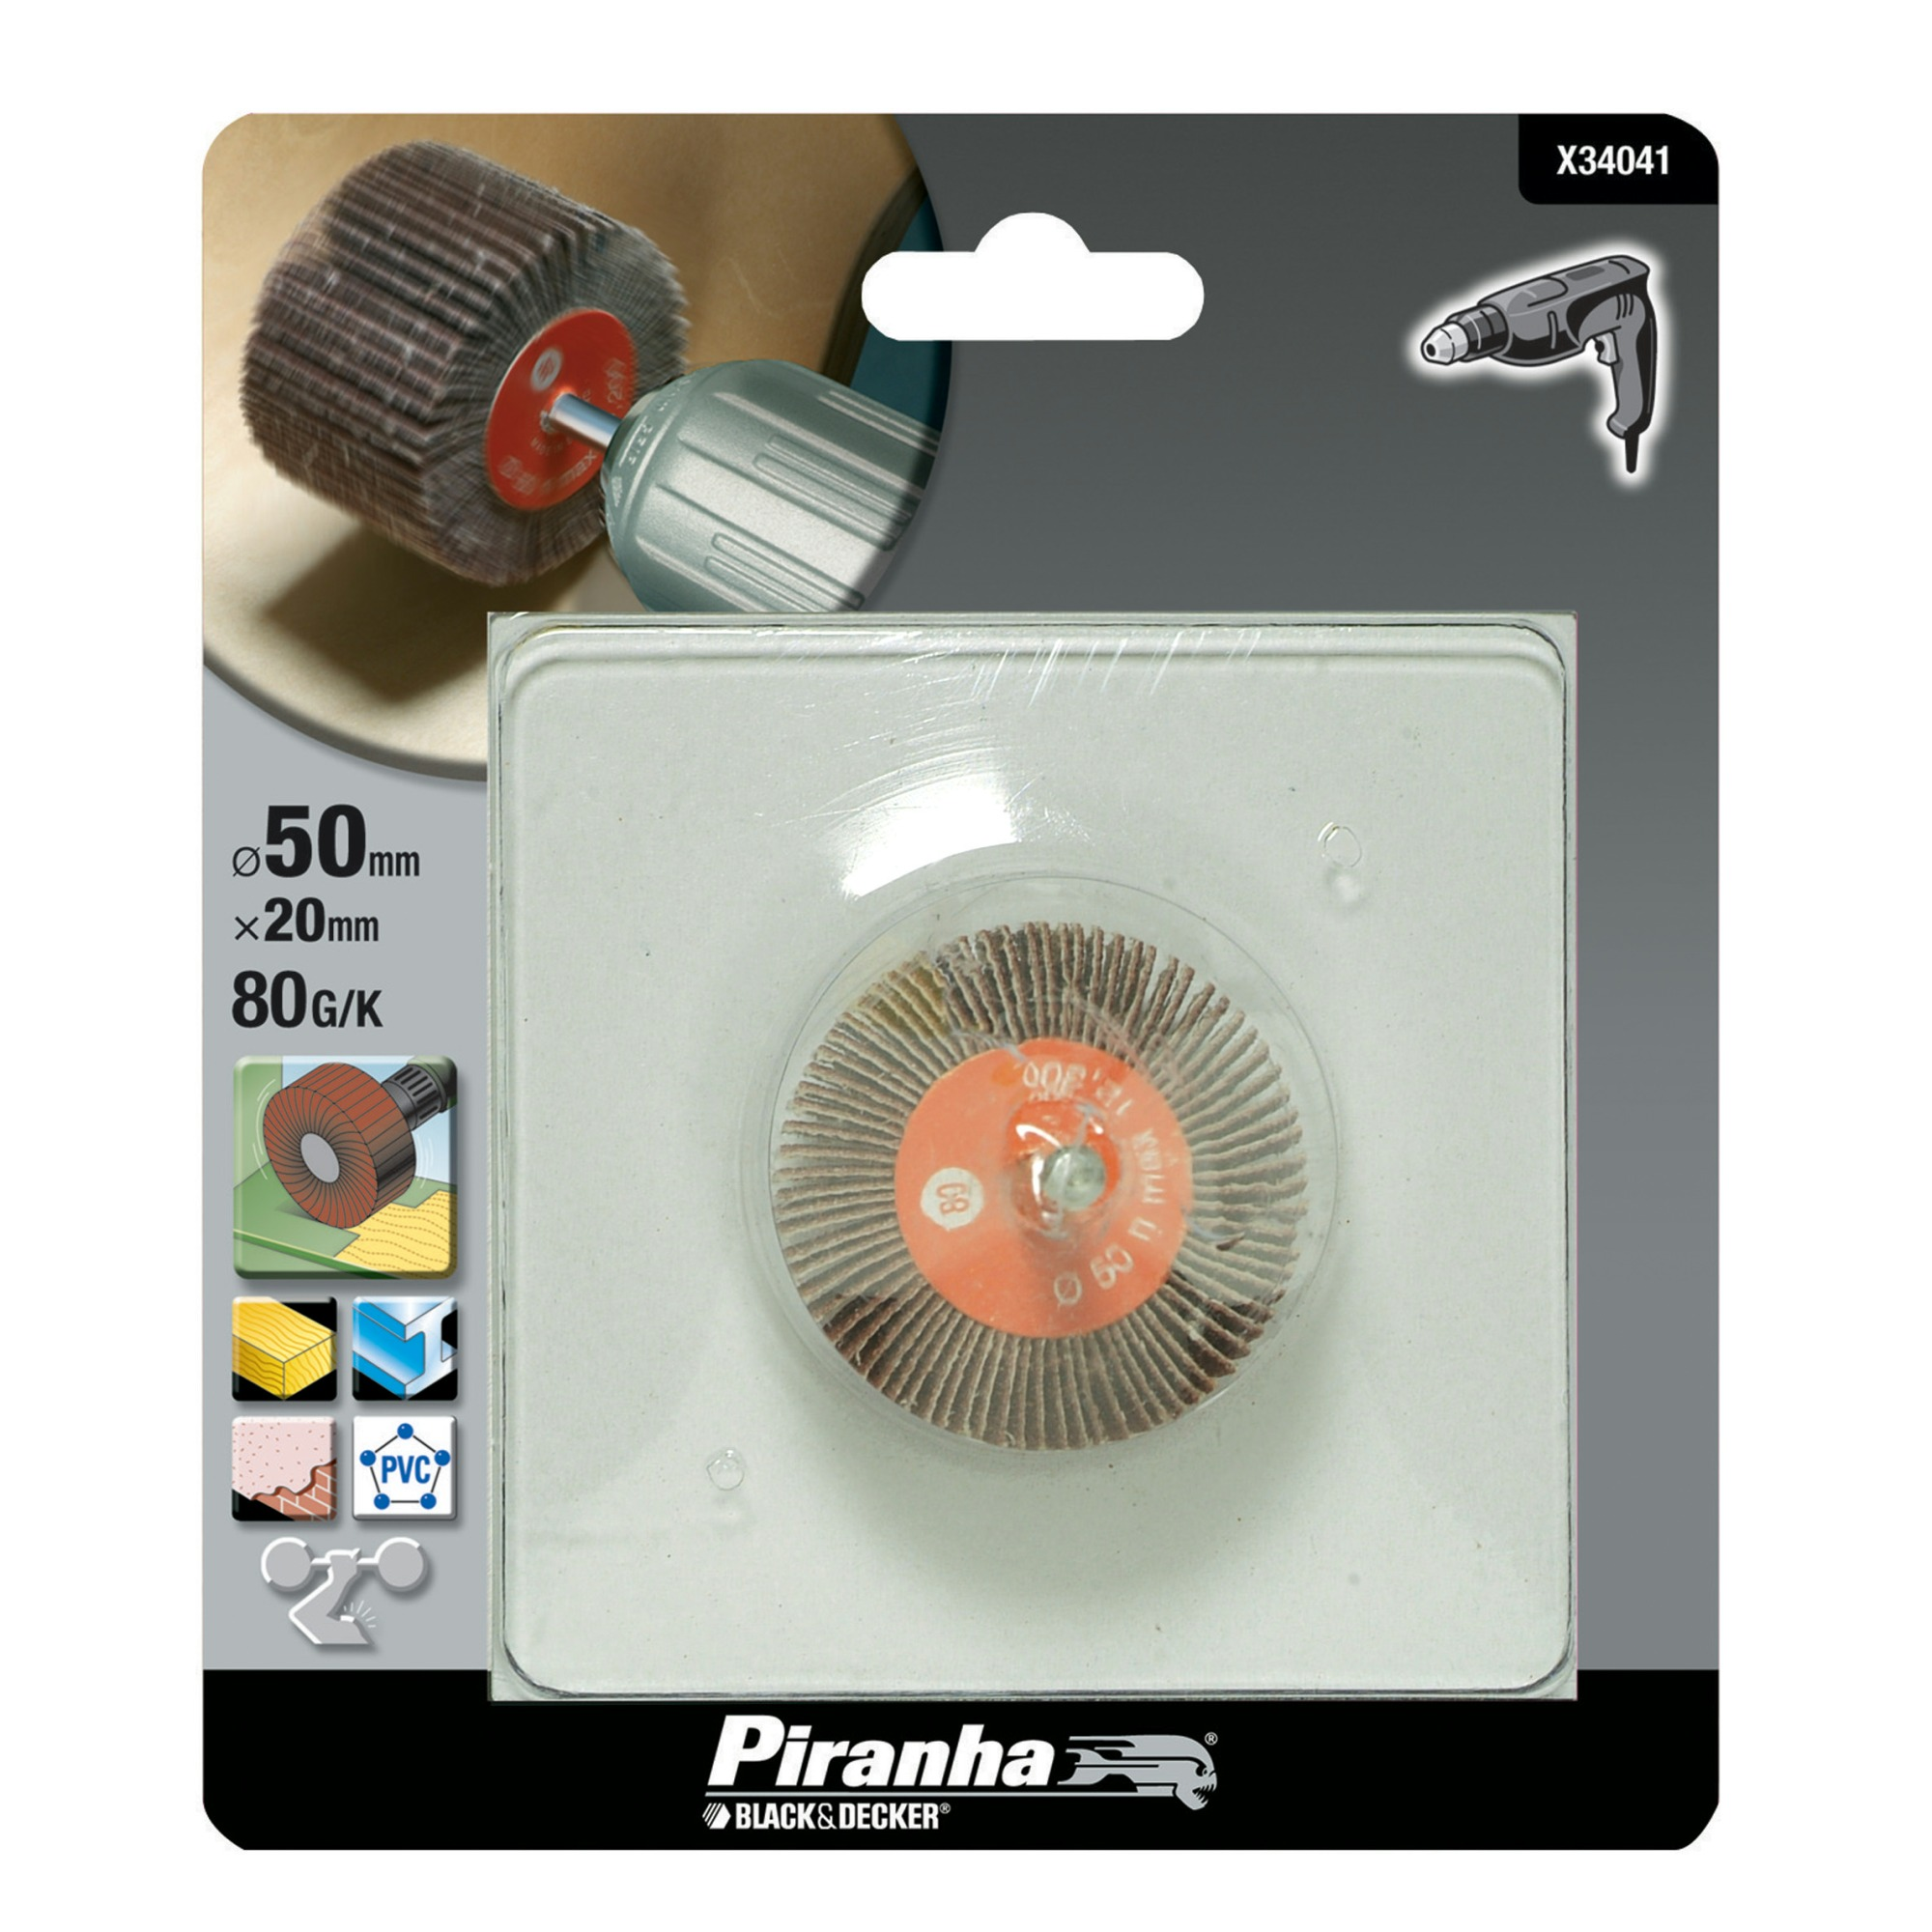 Piranha lamelschuurwiel X34041 K80 20 mm